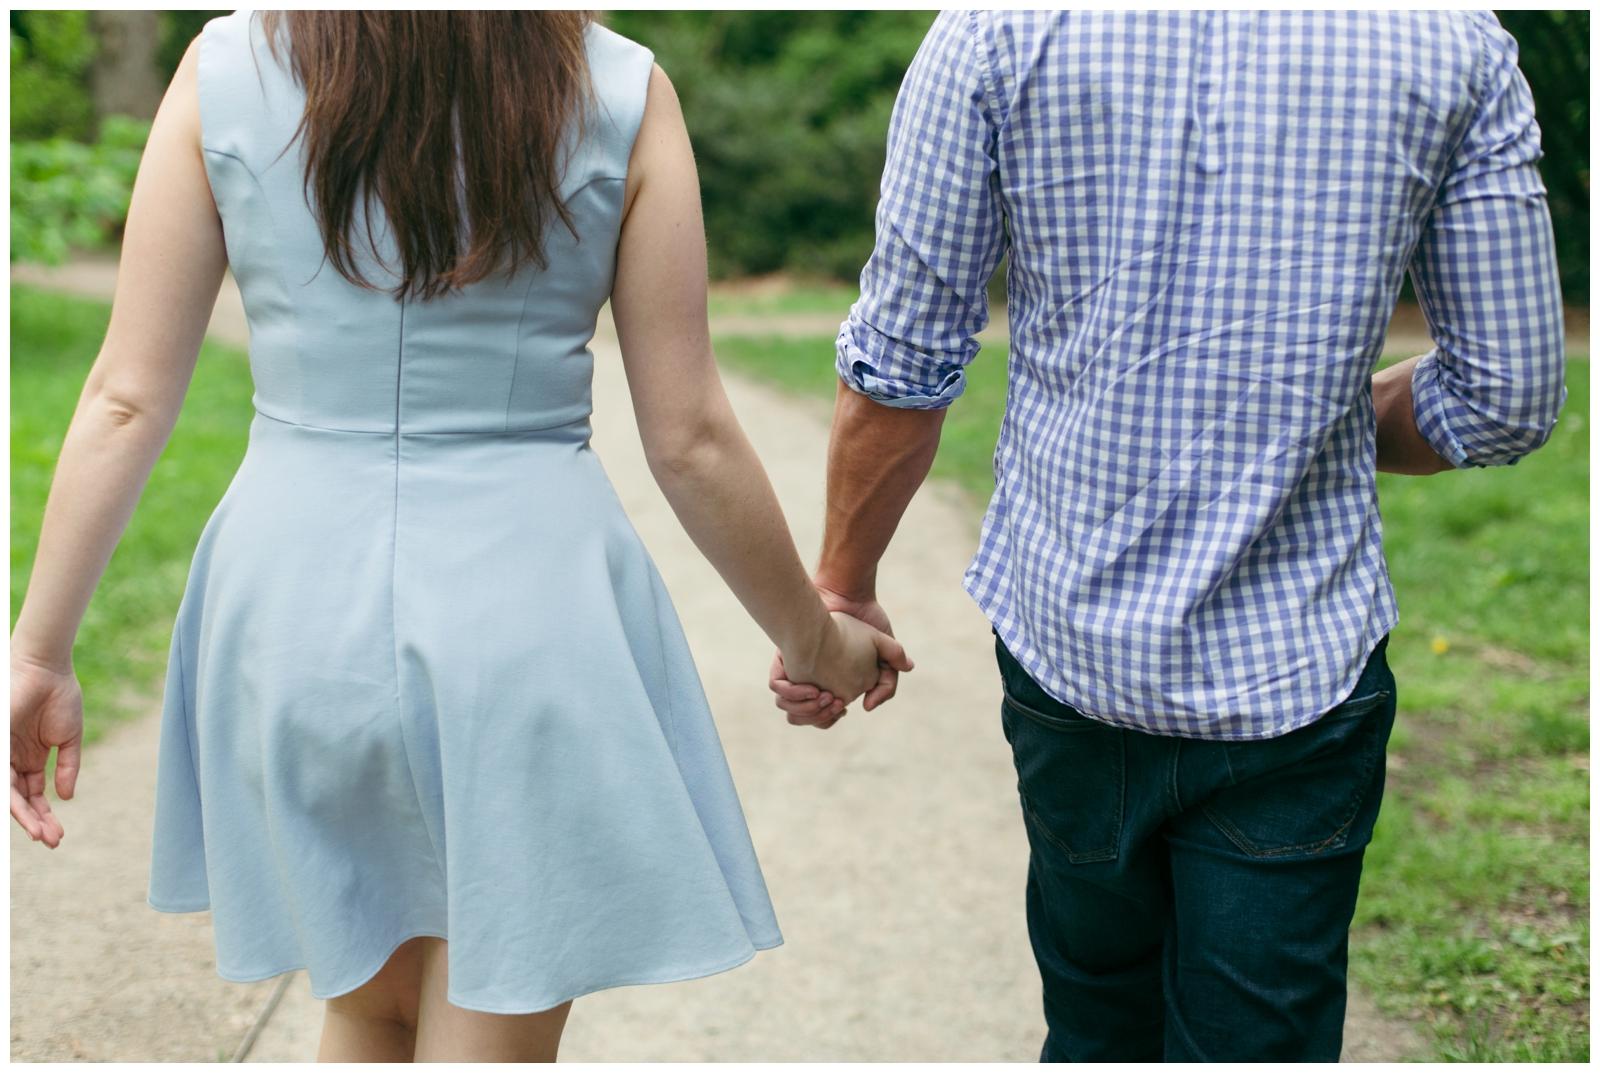 Arnold-Arboretum-Engagement-Boston-Wedding-Photographer-Bailey-Q-Photo-002.jpg